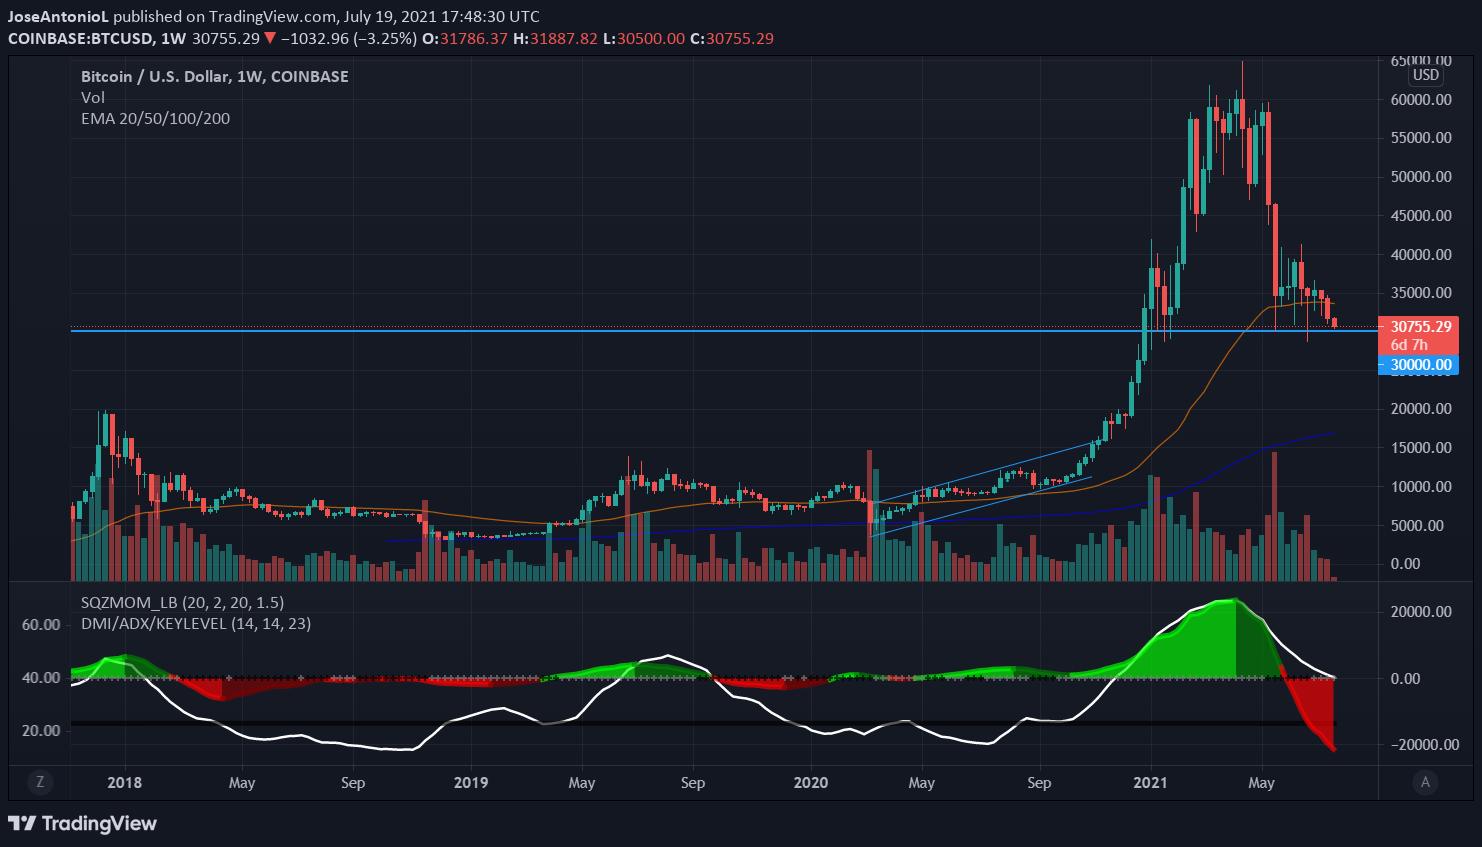 Bitcoin Price. Image: Tradingview.com